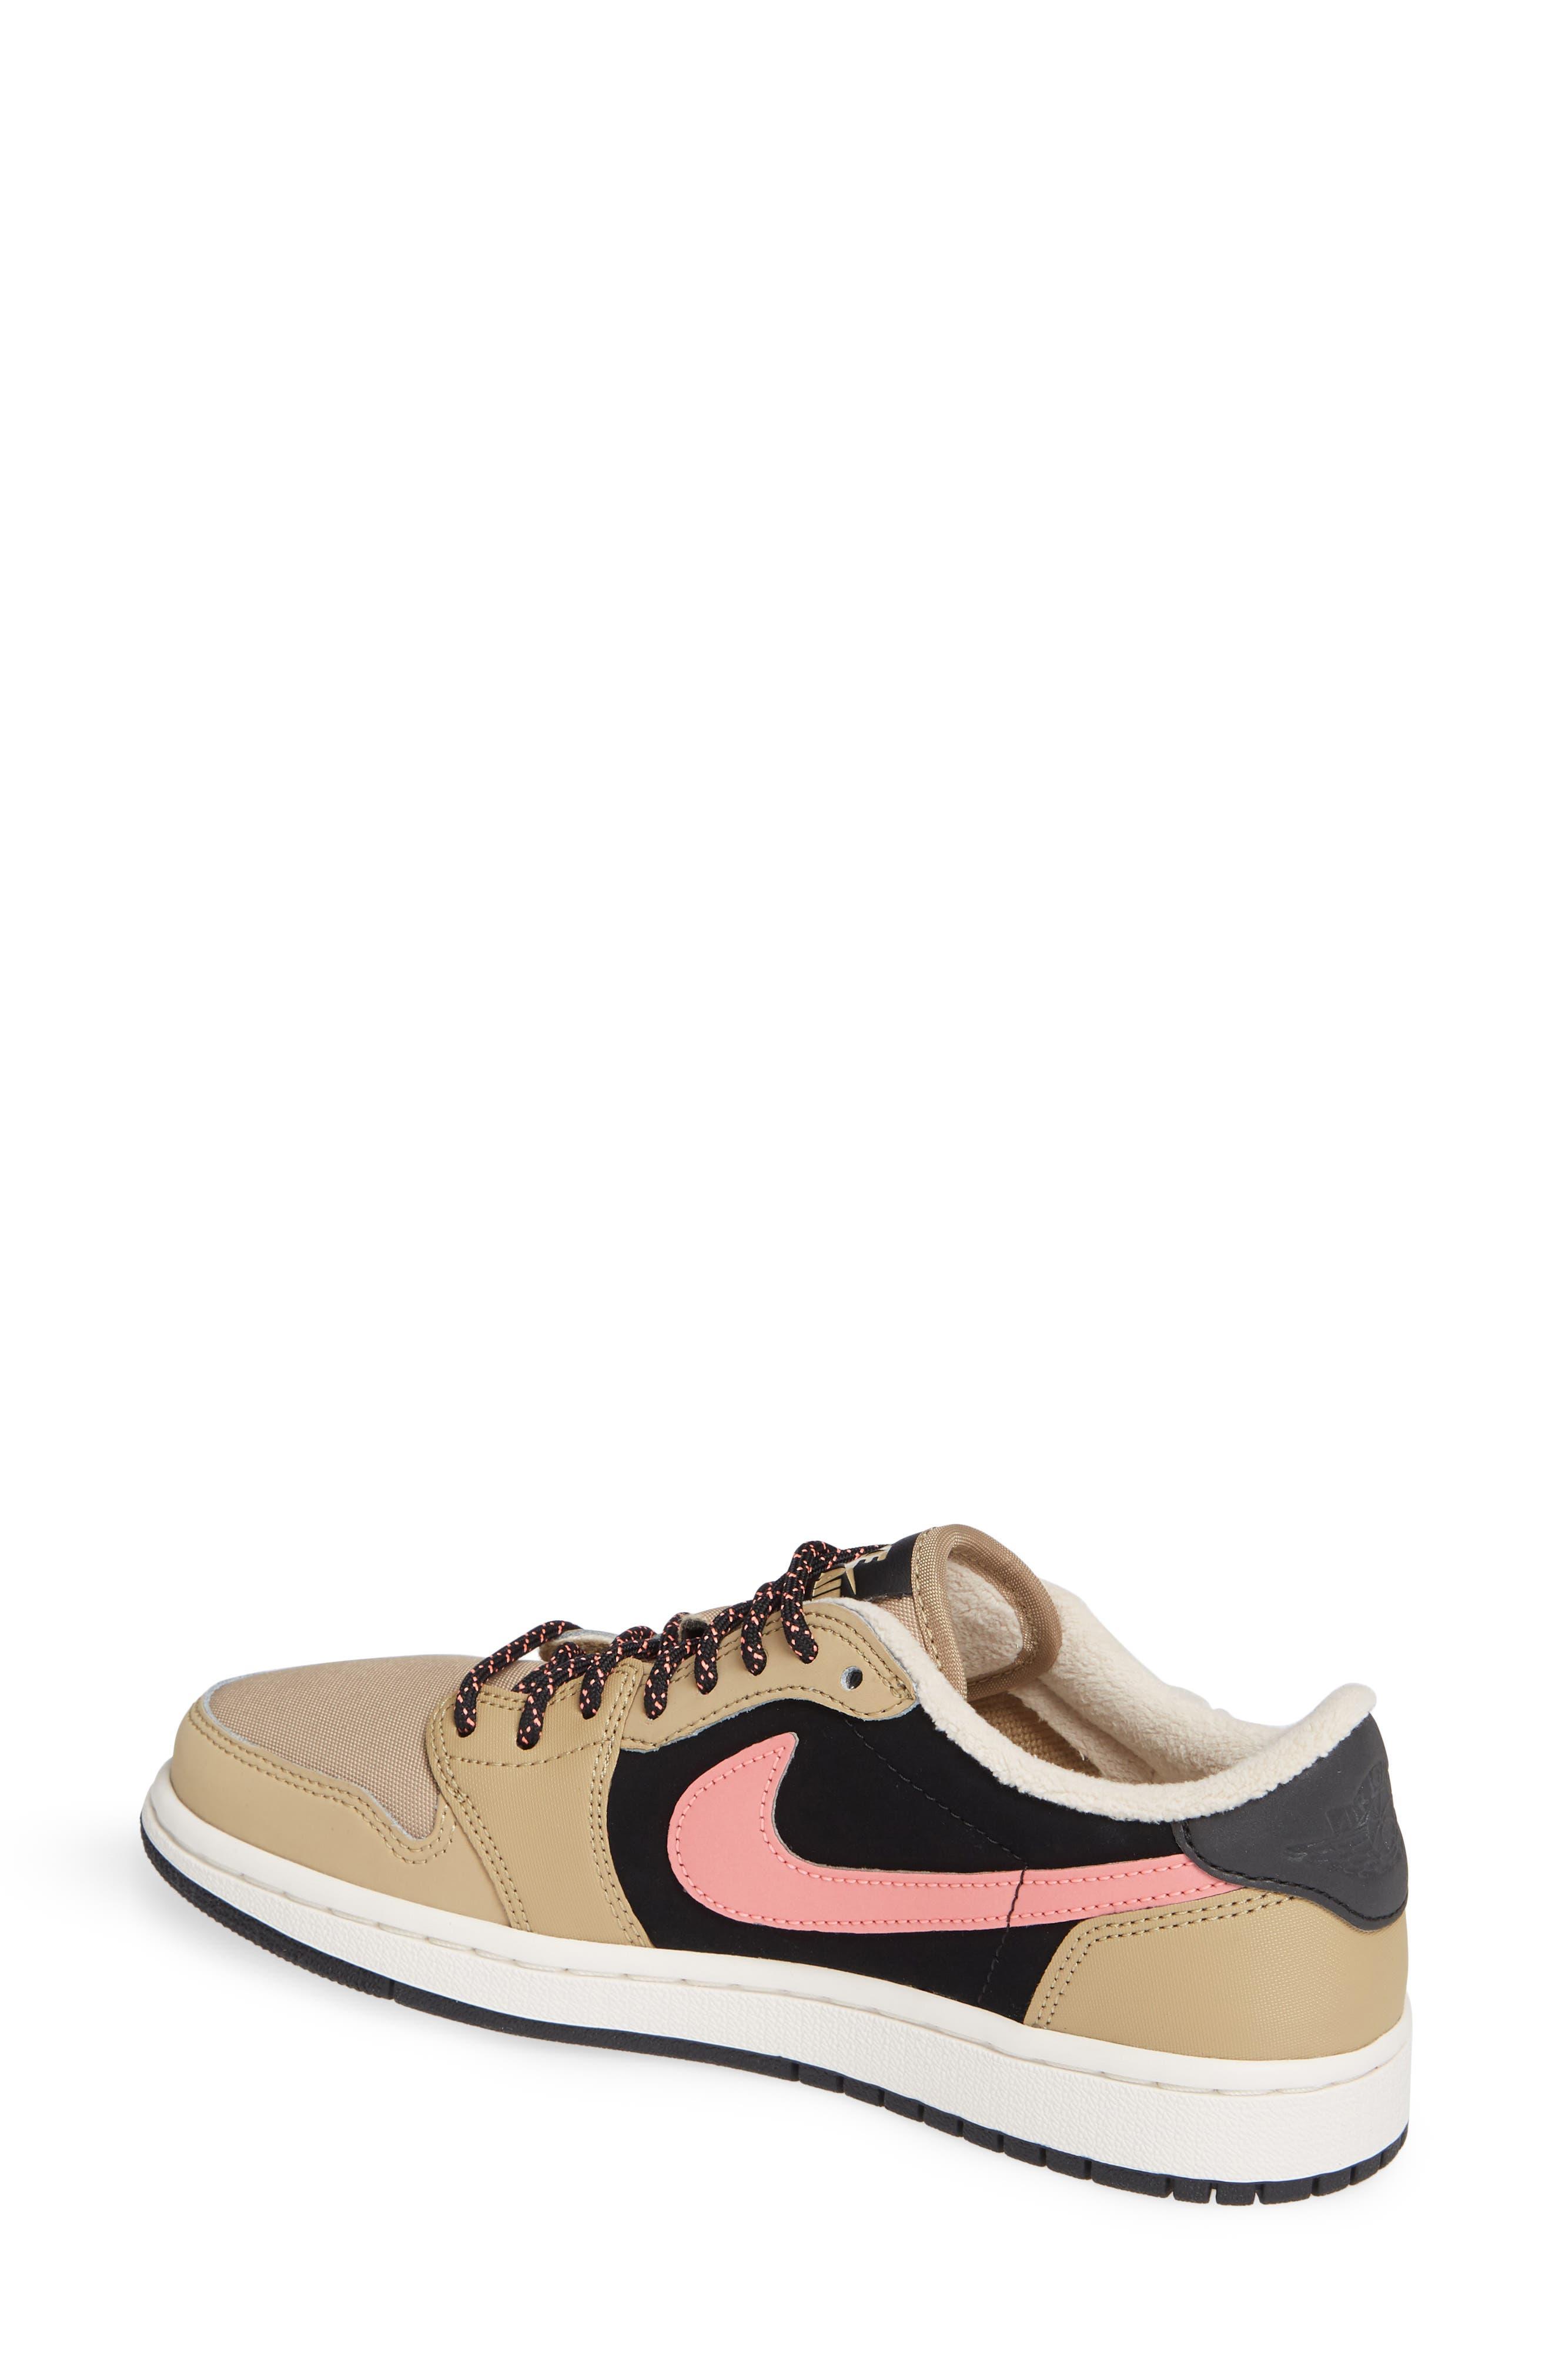 NIKE,                             Air Jordan 1 Retro Low OG Sneaker,                             Alternate thumbnail 2, color,                             200